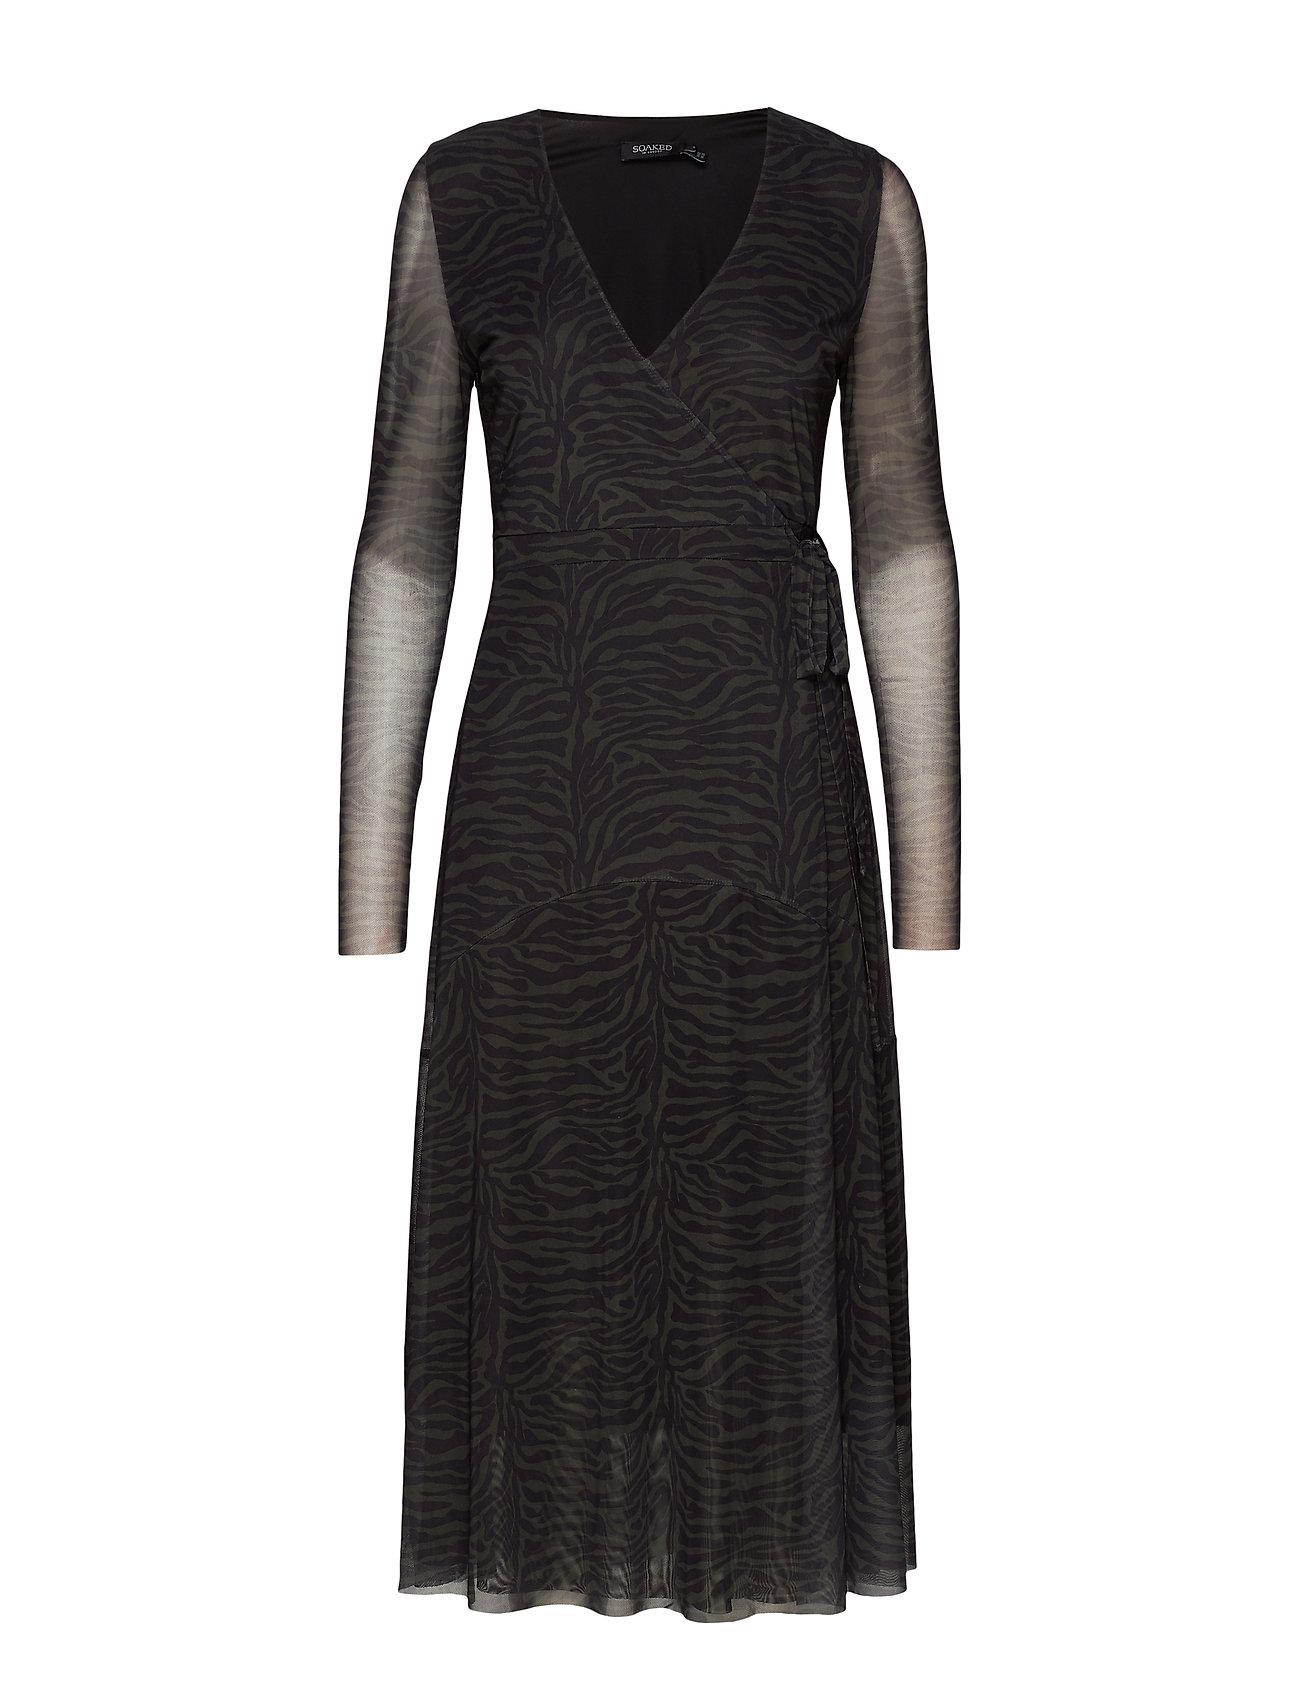 Soaked in Luxury SL Jewel dress - FOREST NIGHT PRINT